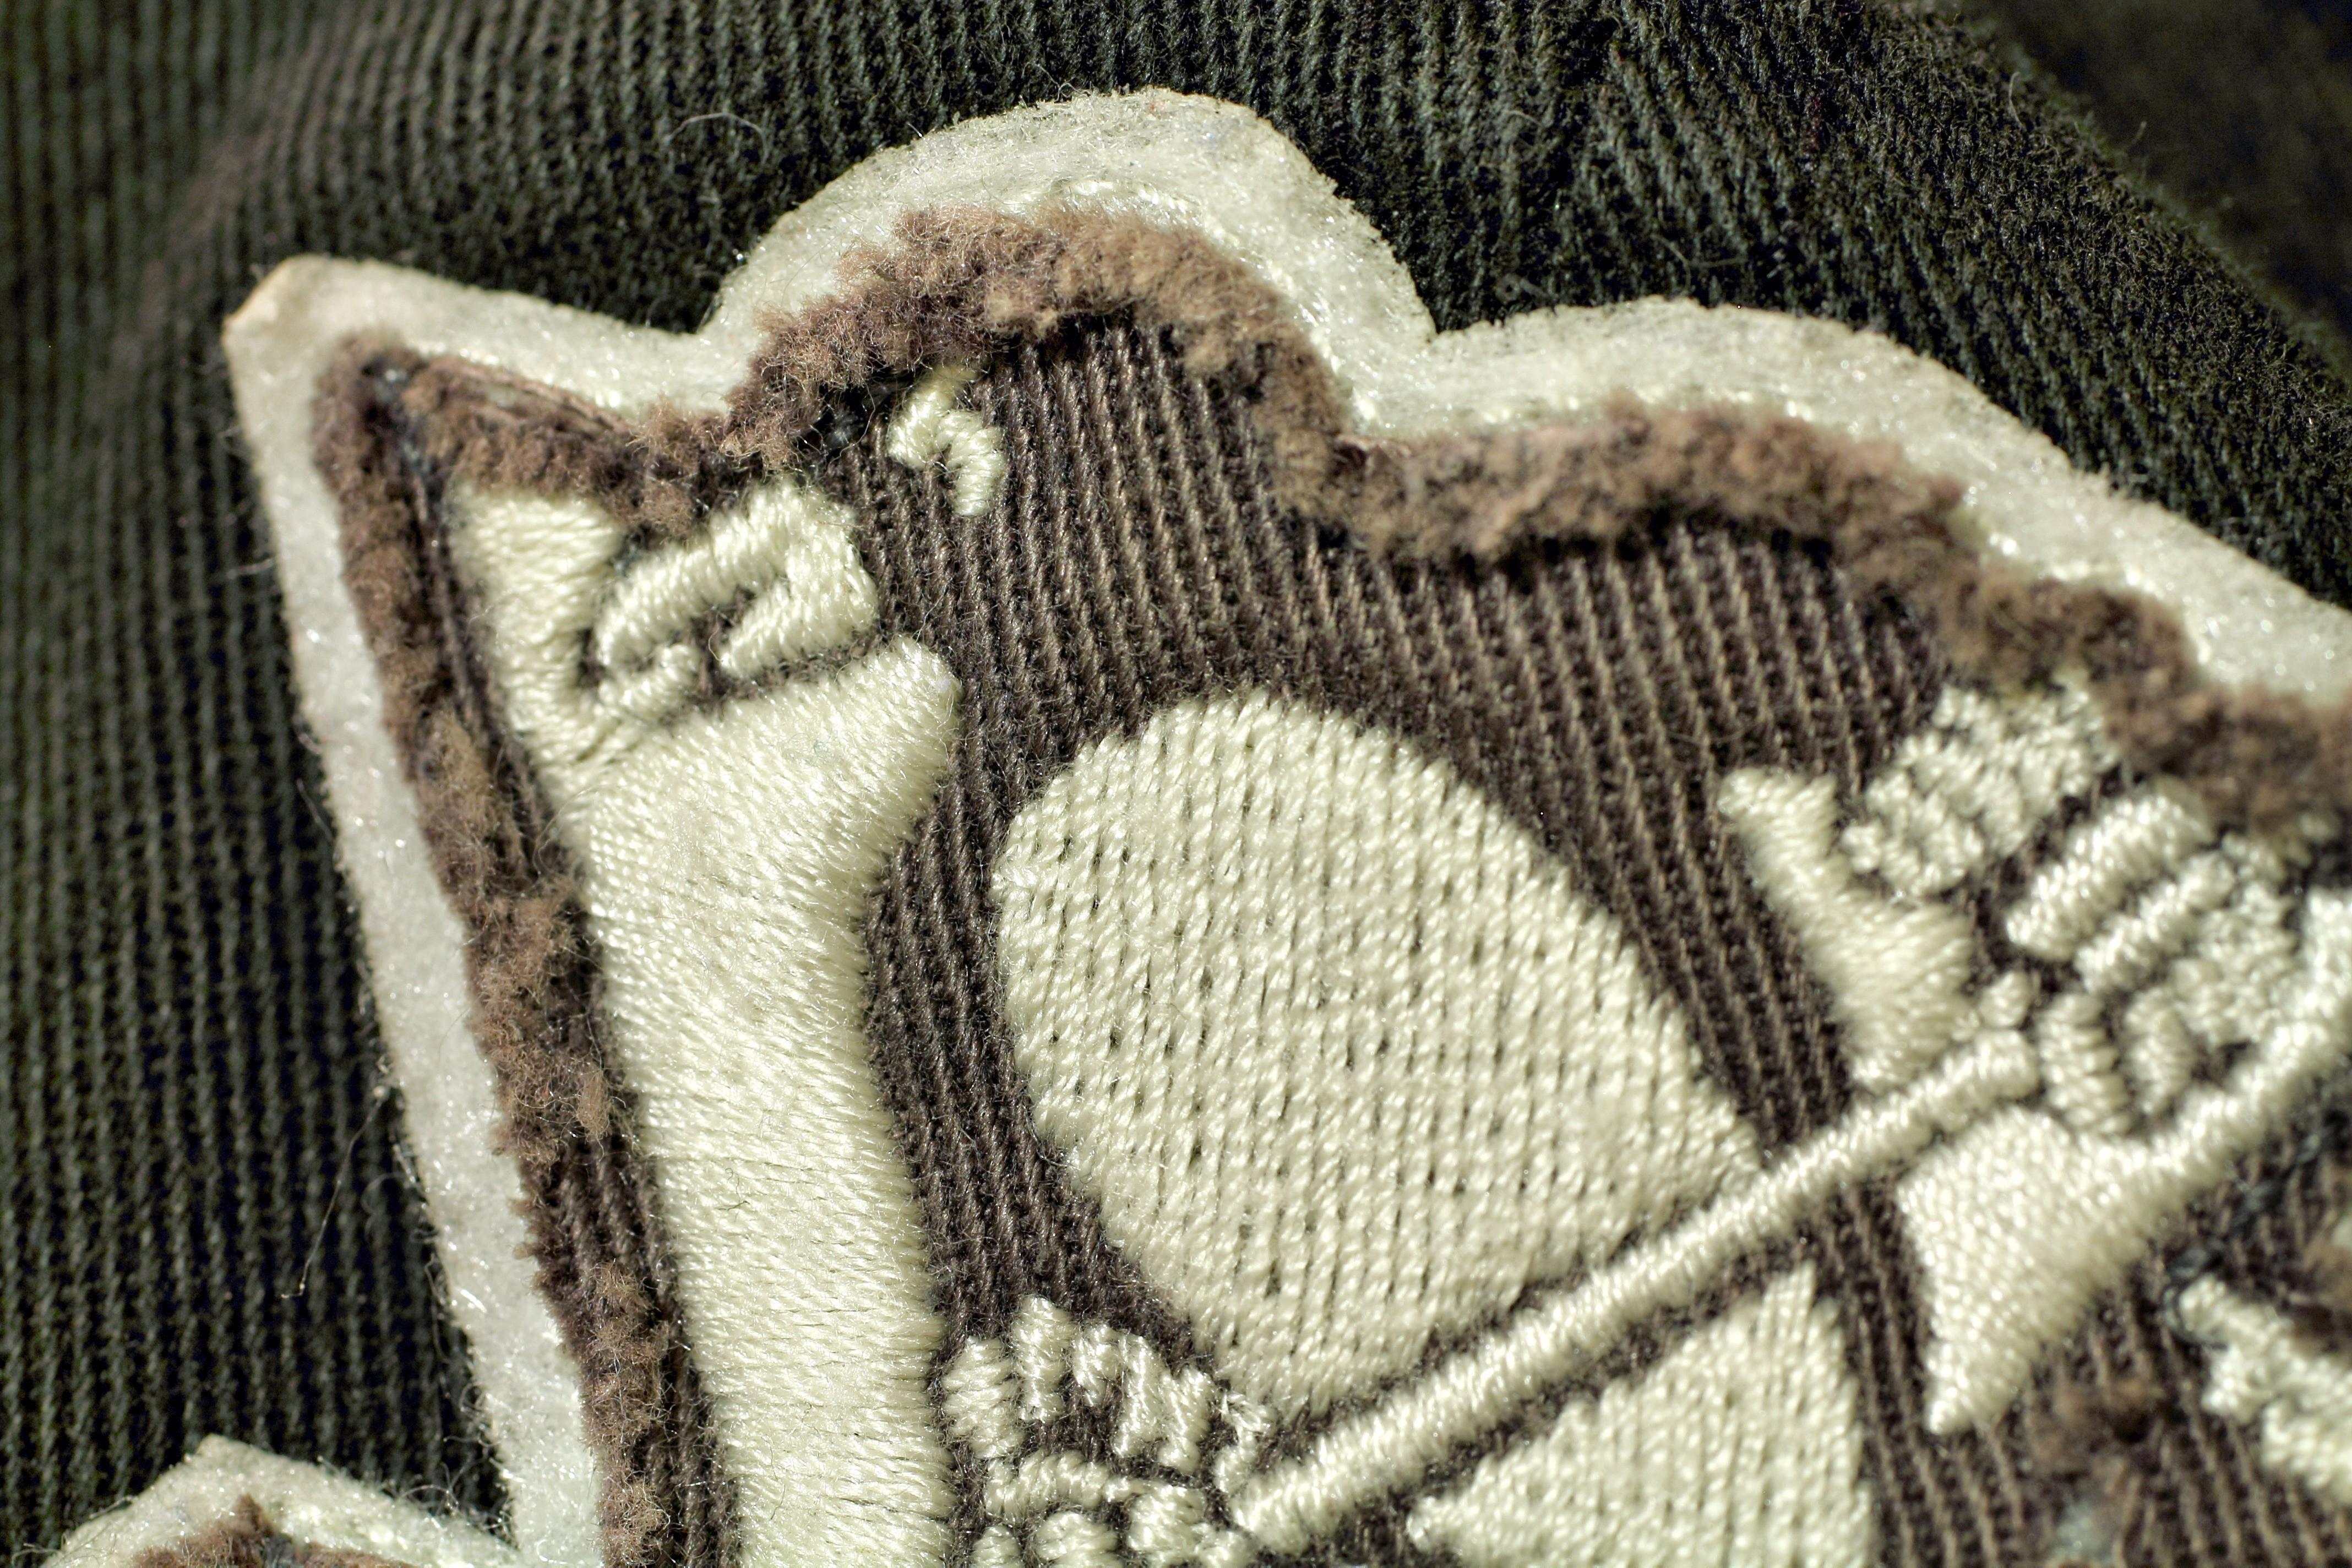 Wallpaper Pattern Hockey Crochet Pittsburgh Penguins Art Textile 4272x2848 Px Ancient History Knitting Needlework 4272x2848 4kwallpaper 614857 Hd Wallpapers Wallhere